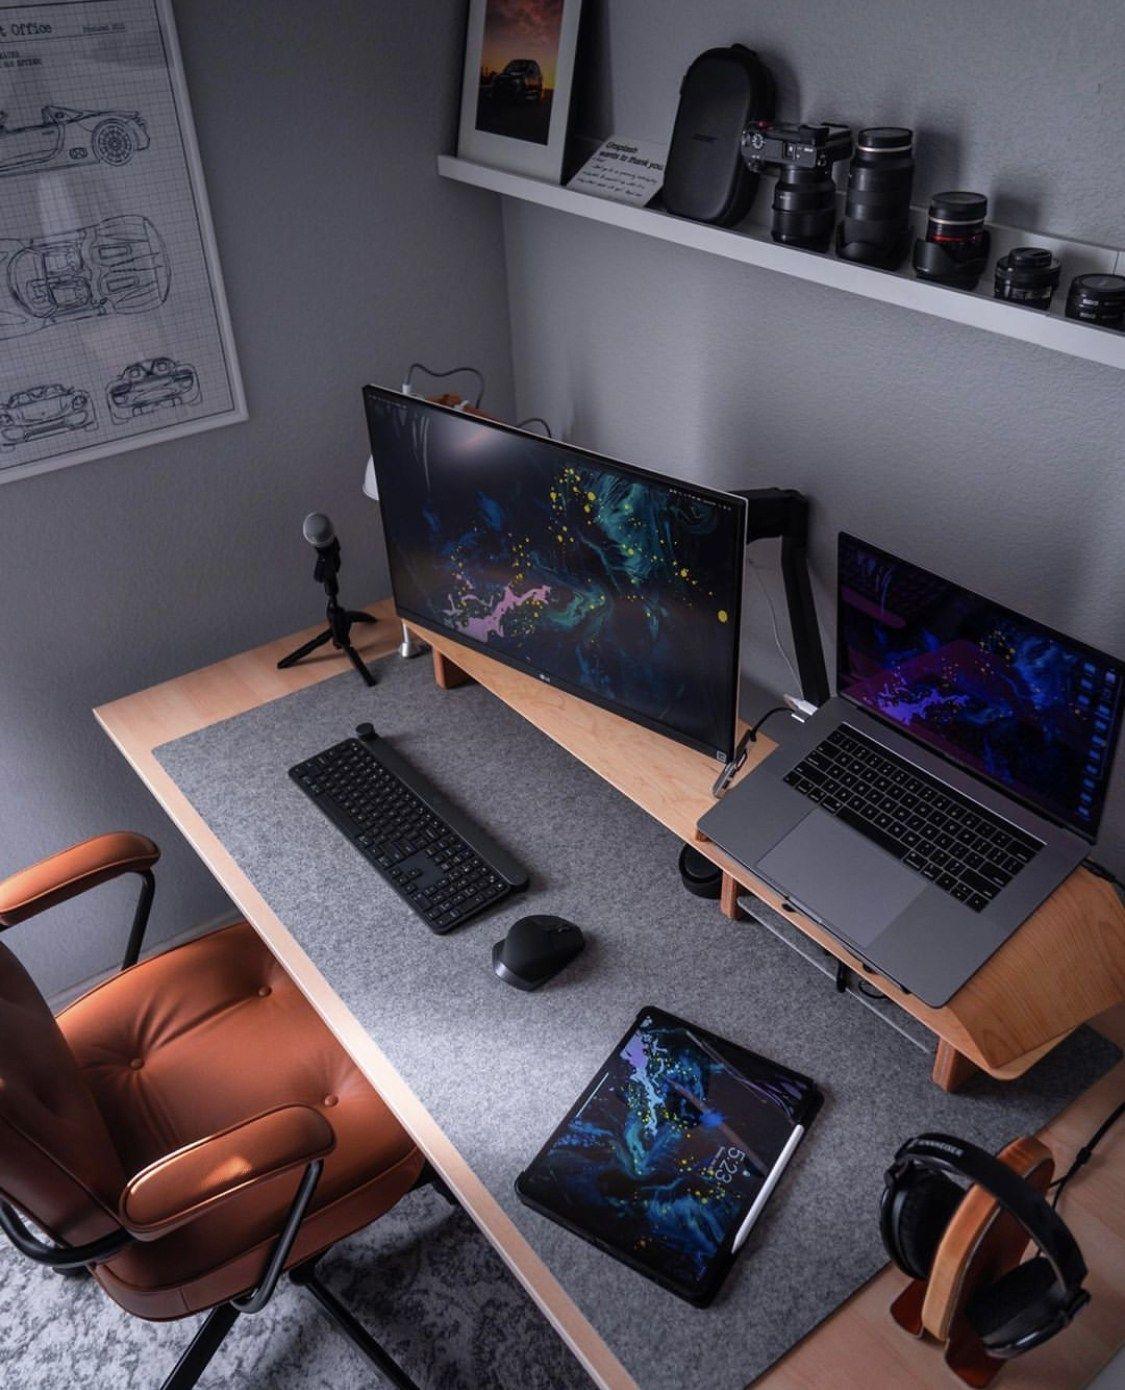 Setup Apple Macbook Pro One Pixel Unlimited Home Office Setup Home Office Design Office Setup